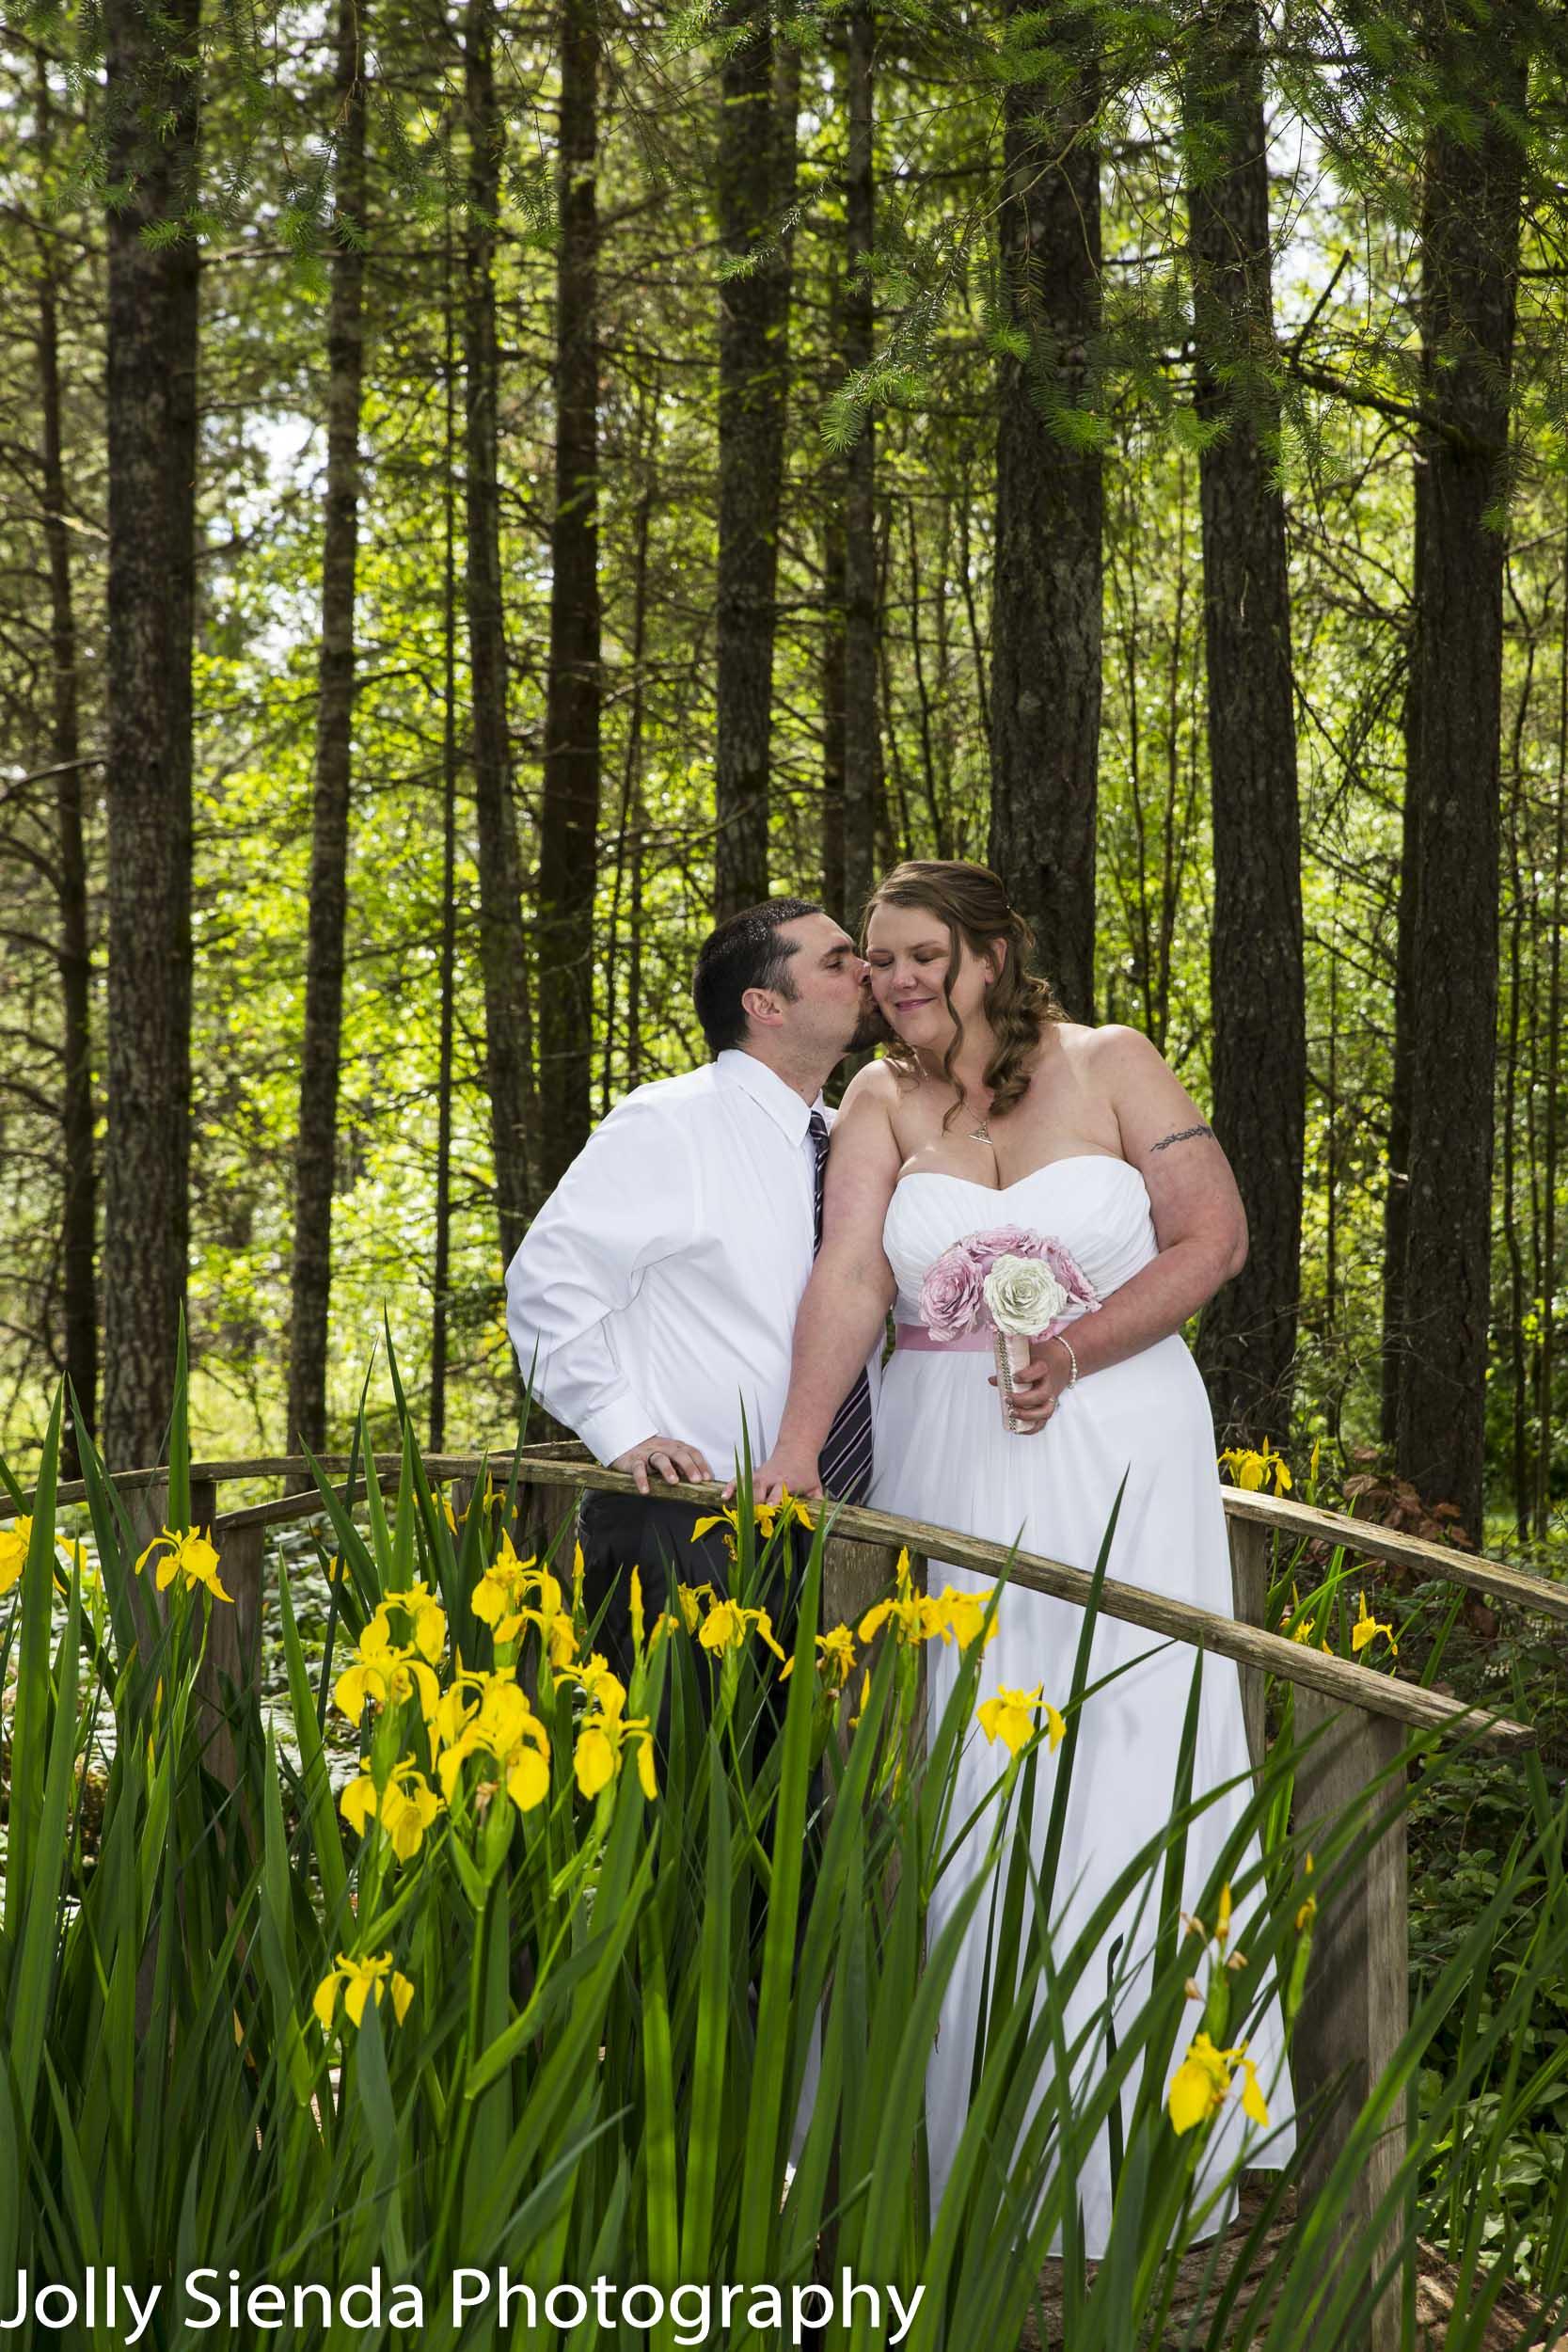 Bride and groom outdoor portrait wedding photography